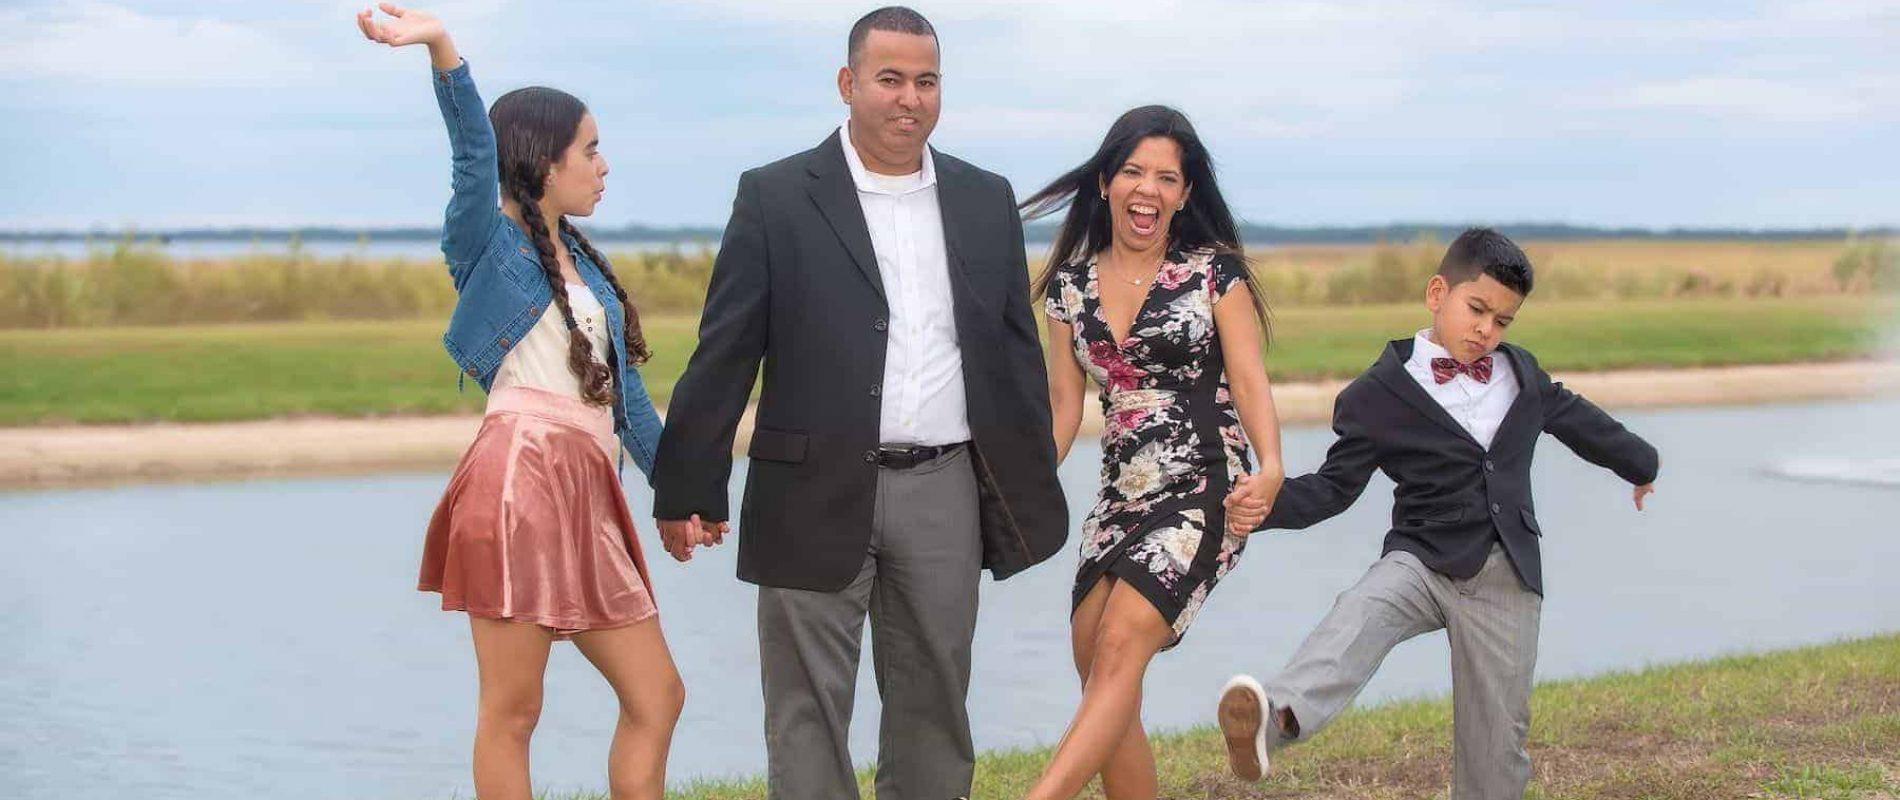 family-lifestyle-sophias-art-photo-50.jpg